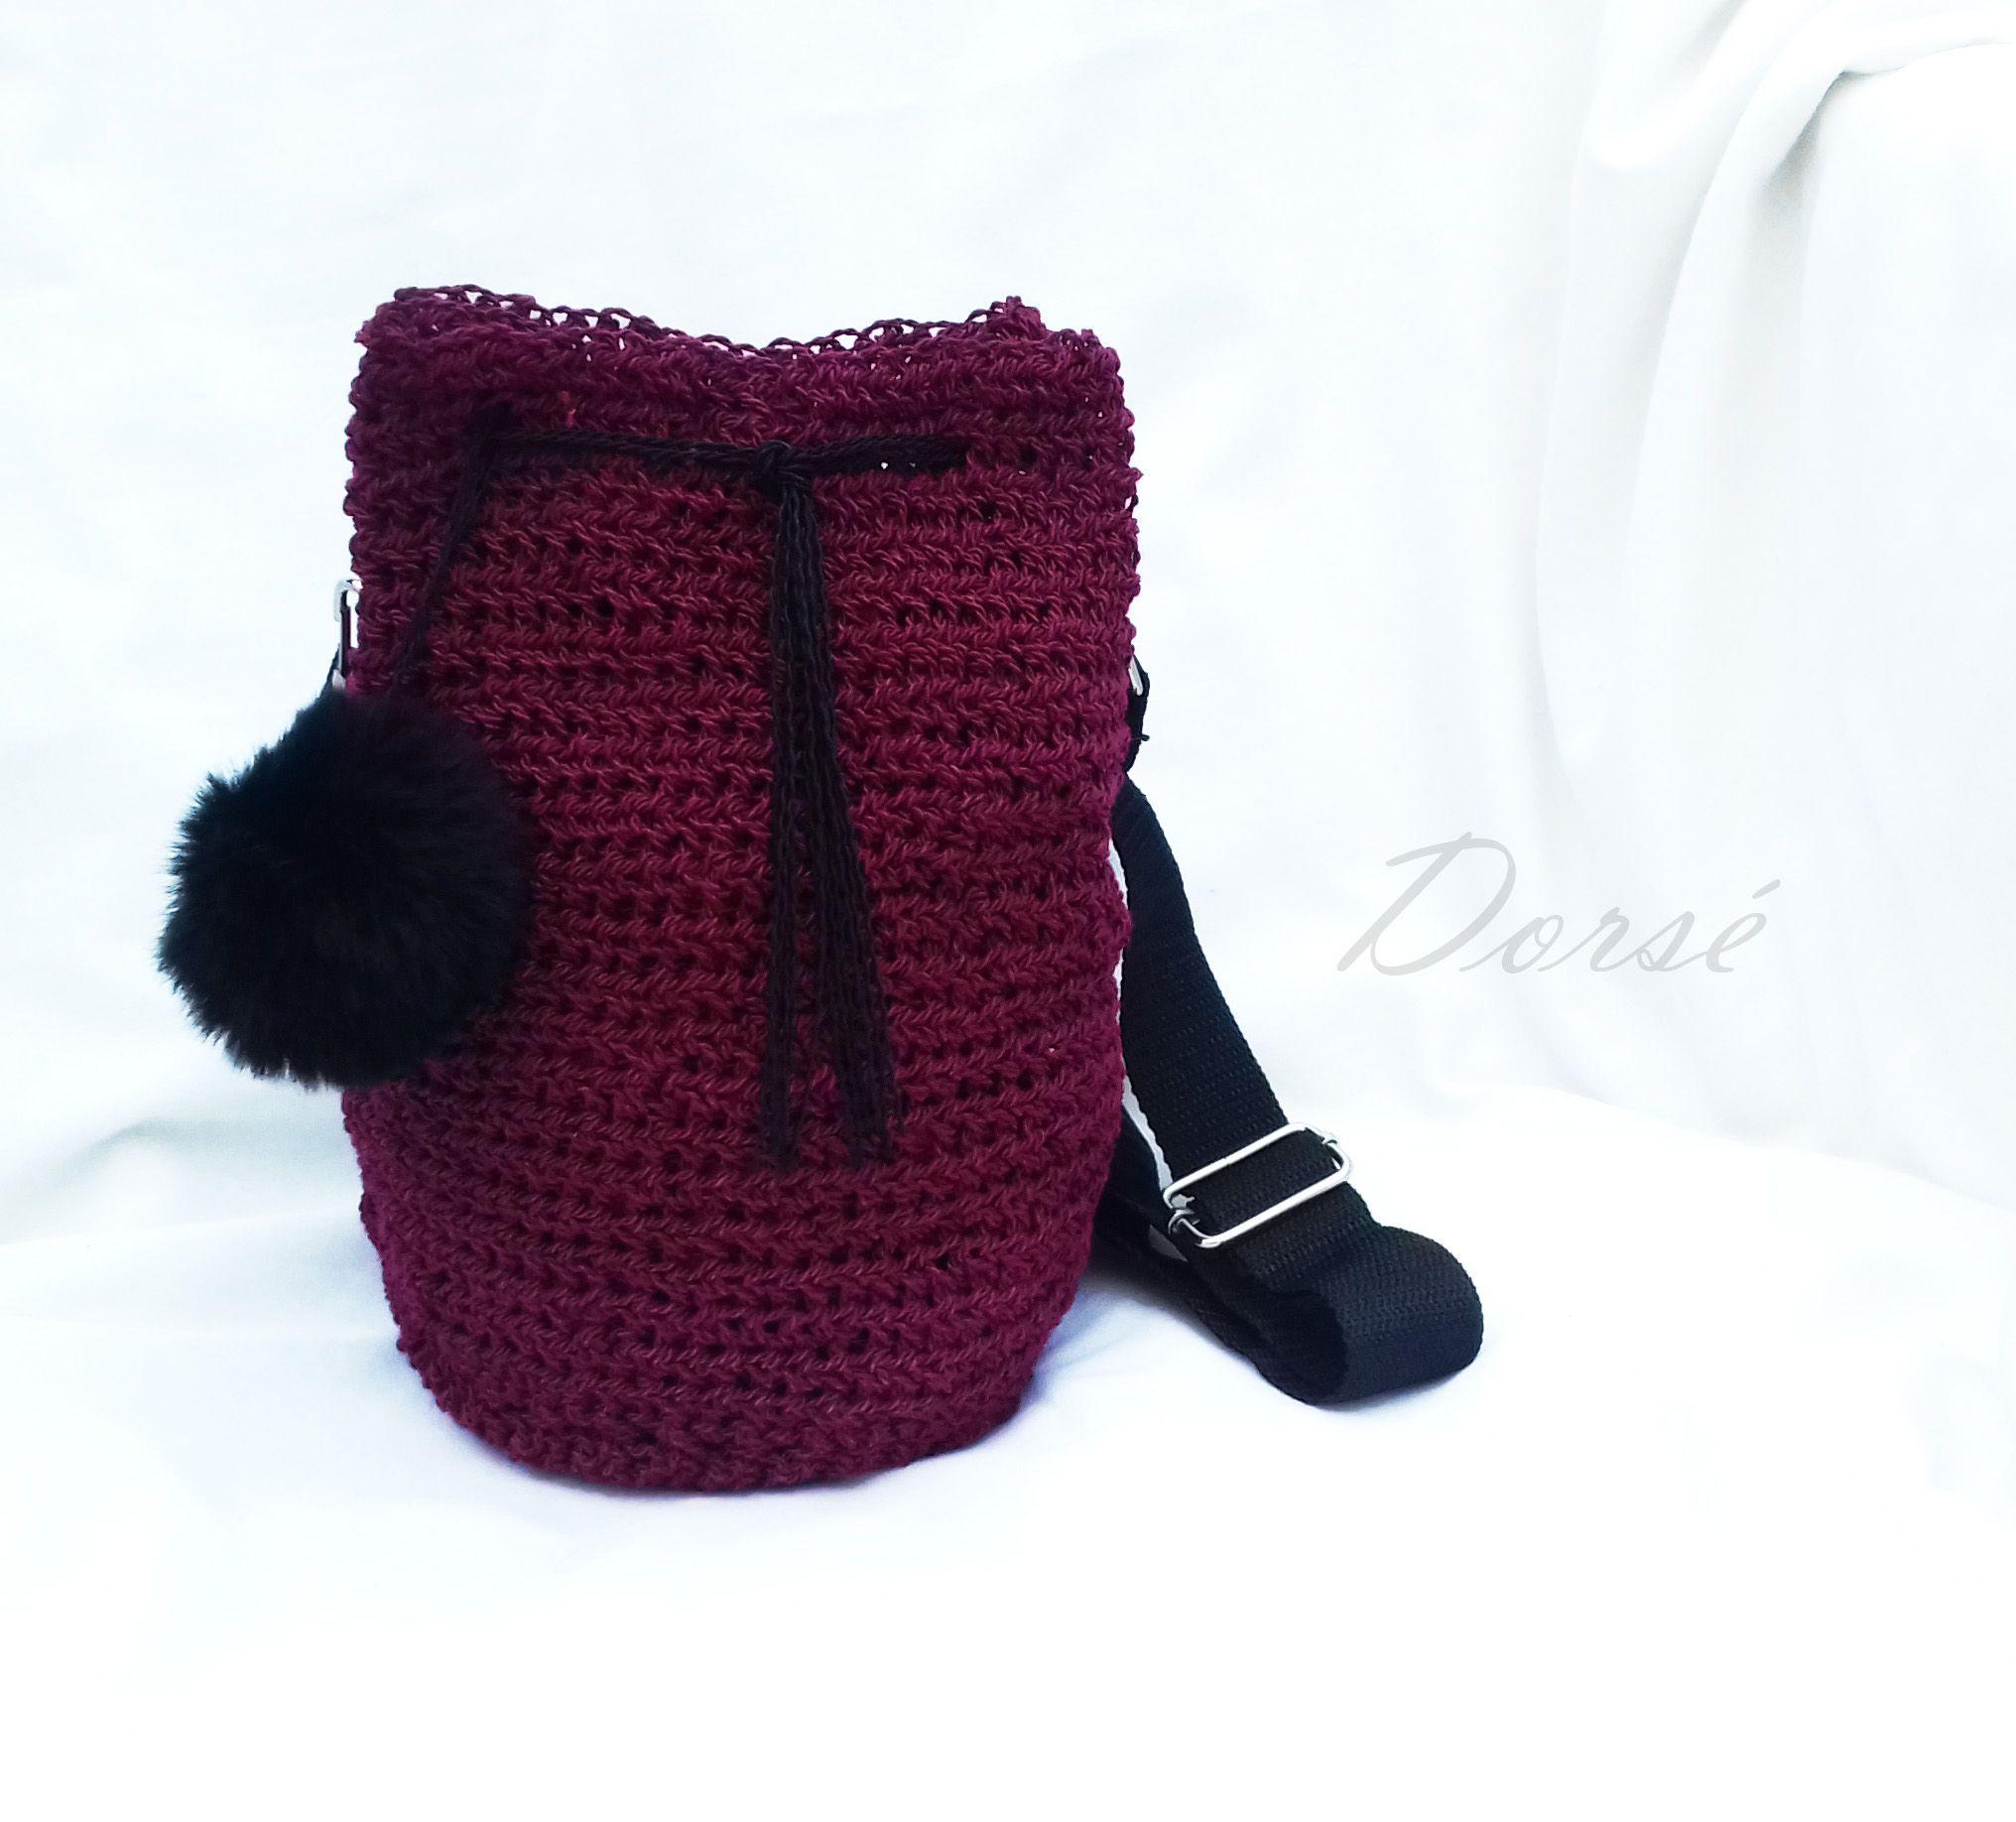 DORSÉ Hungary 2018 Autumn Winter Crochet bag